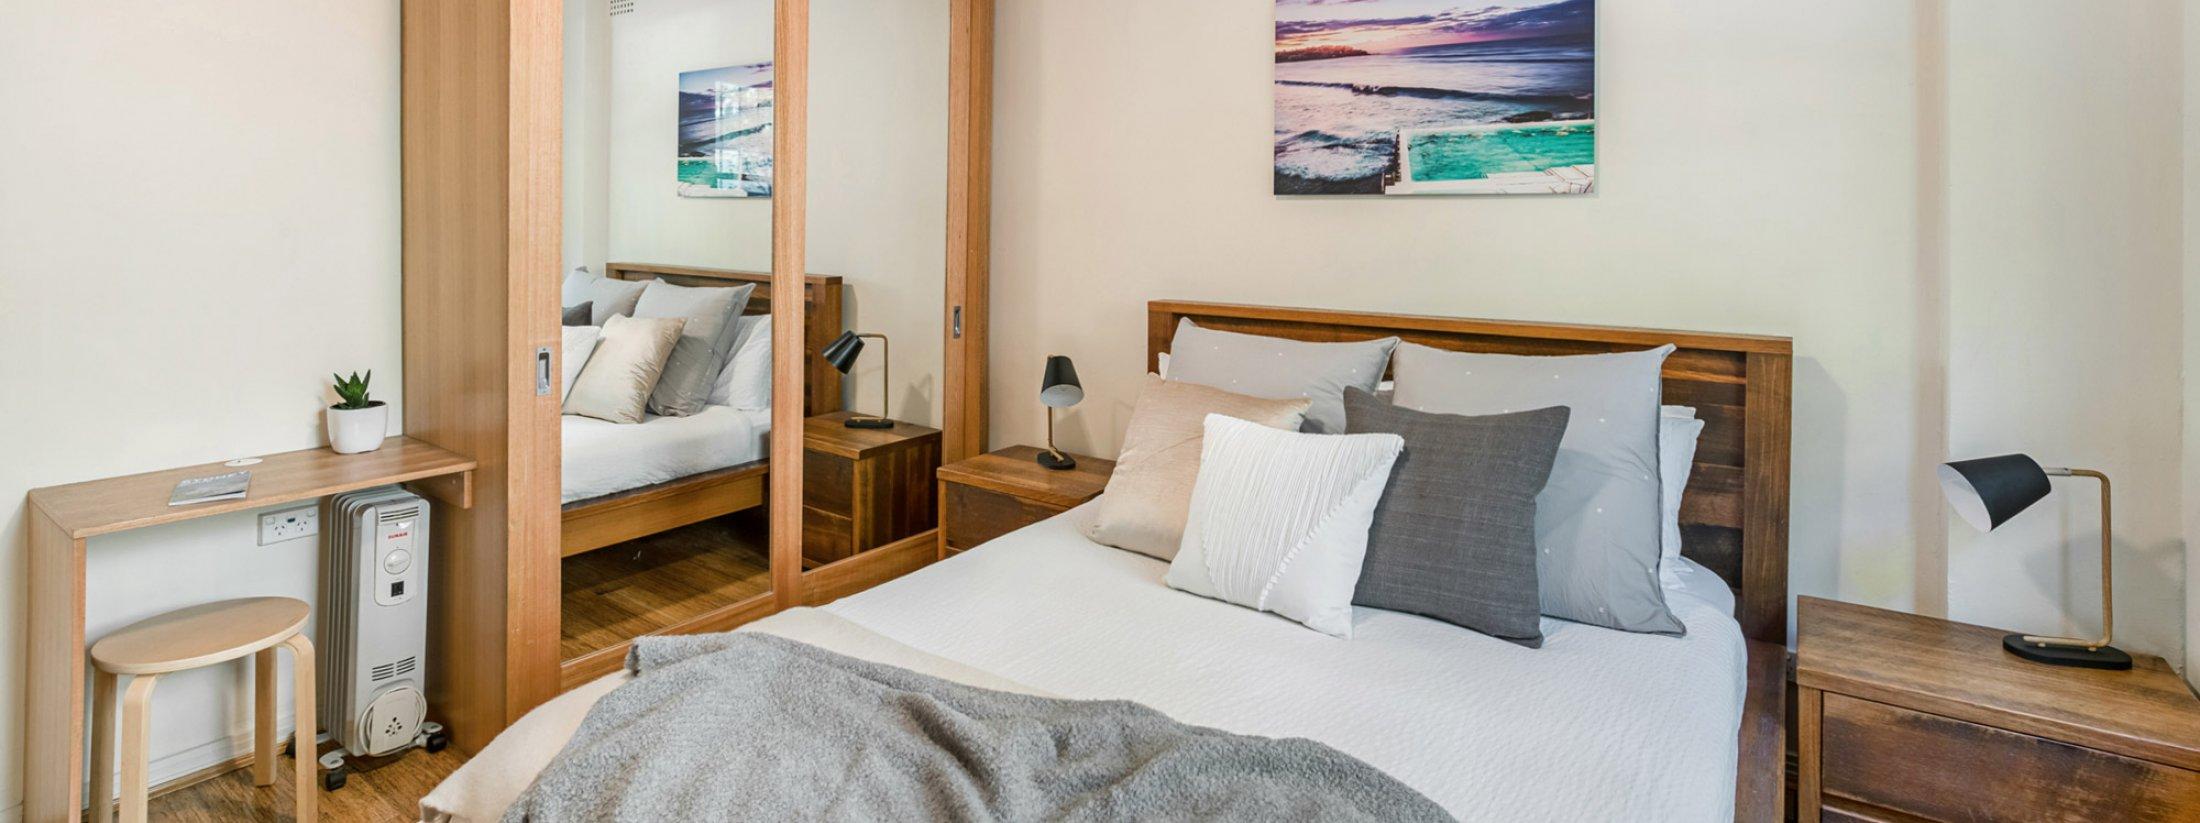 Bondi Beach Peach - Bedroom